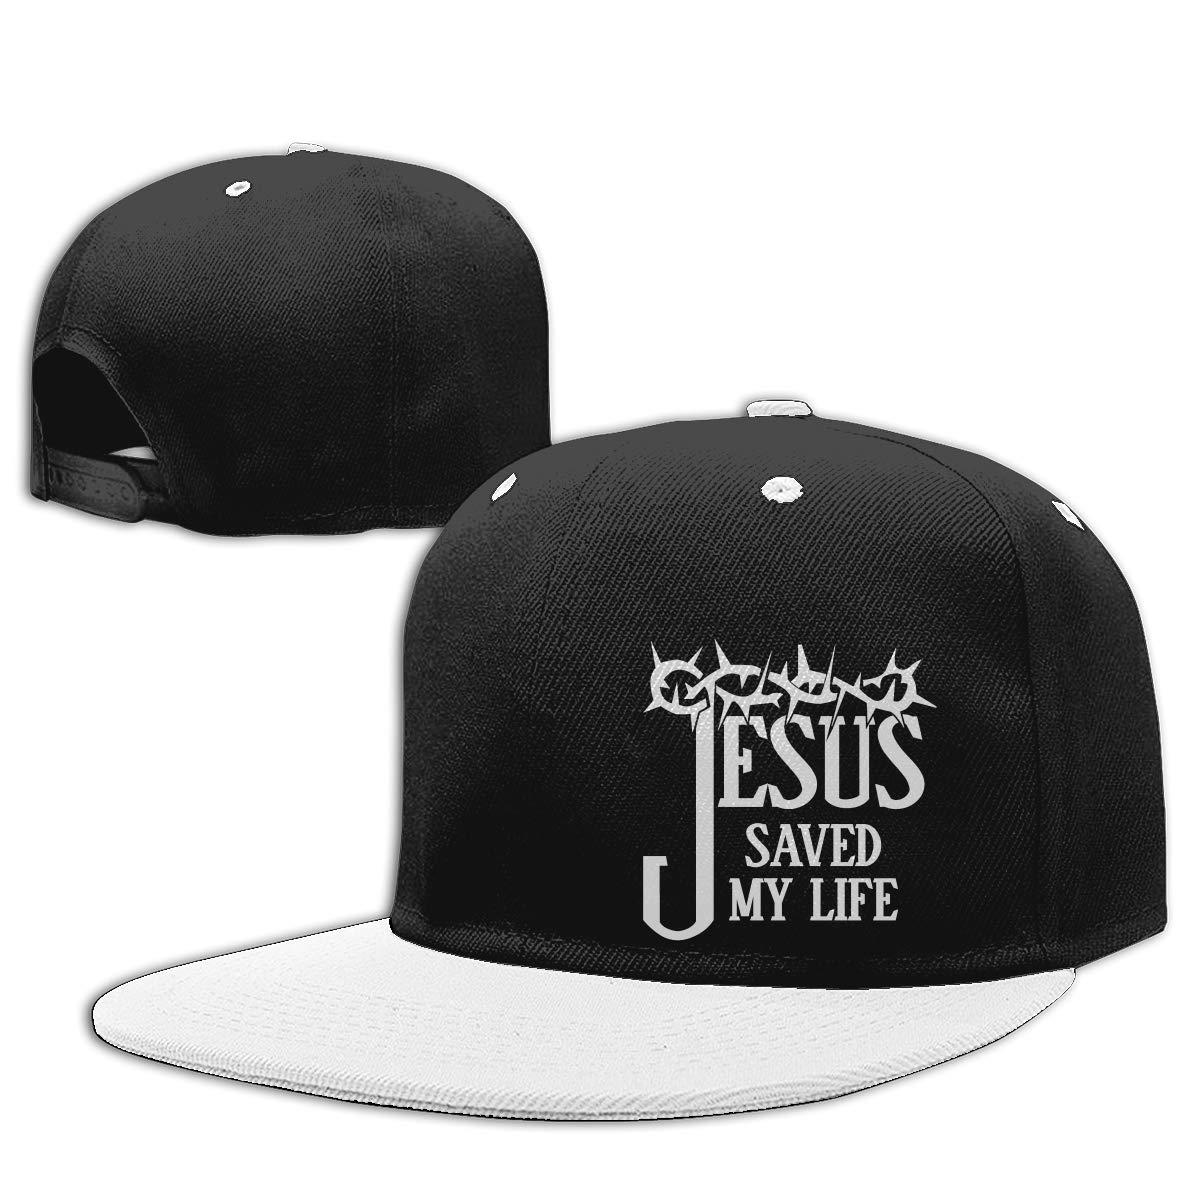 FGGfgg Jesus Saved My Life Pattern Print Adjustable Hip Hop Baseball Cap Visor Adult Baseball Cap